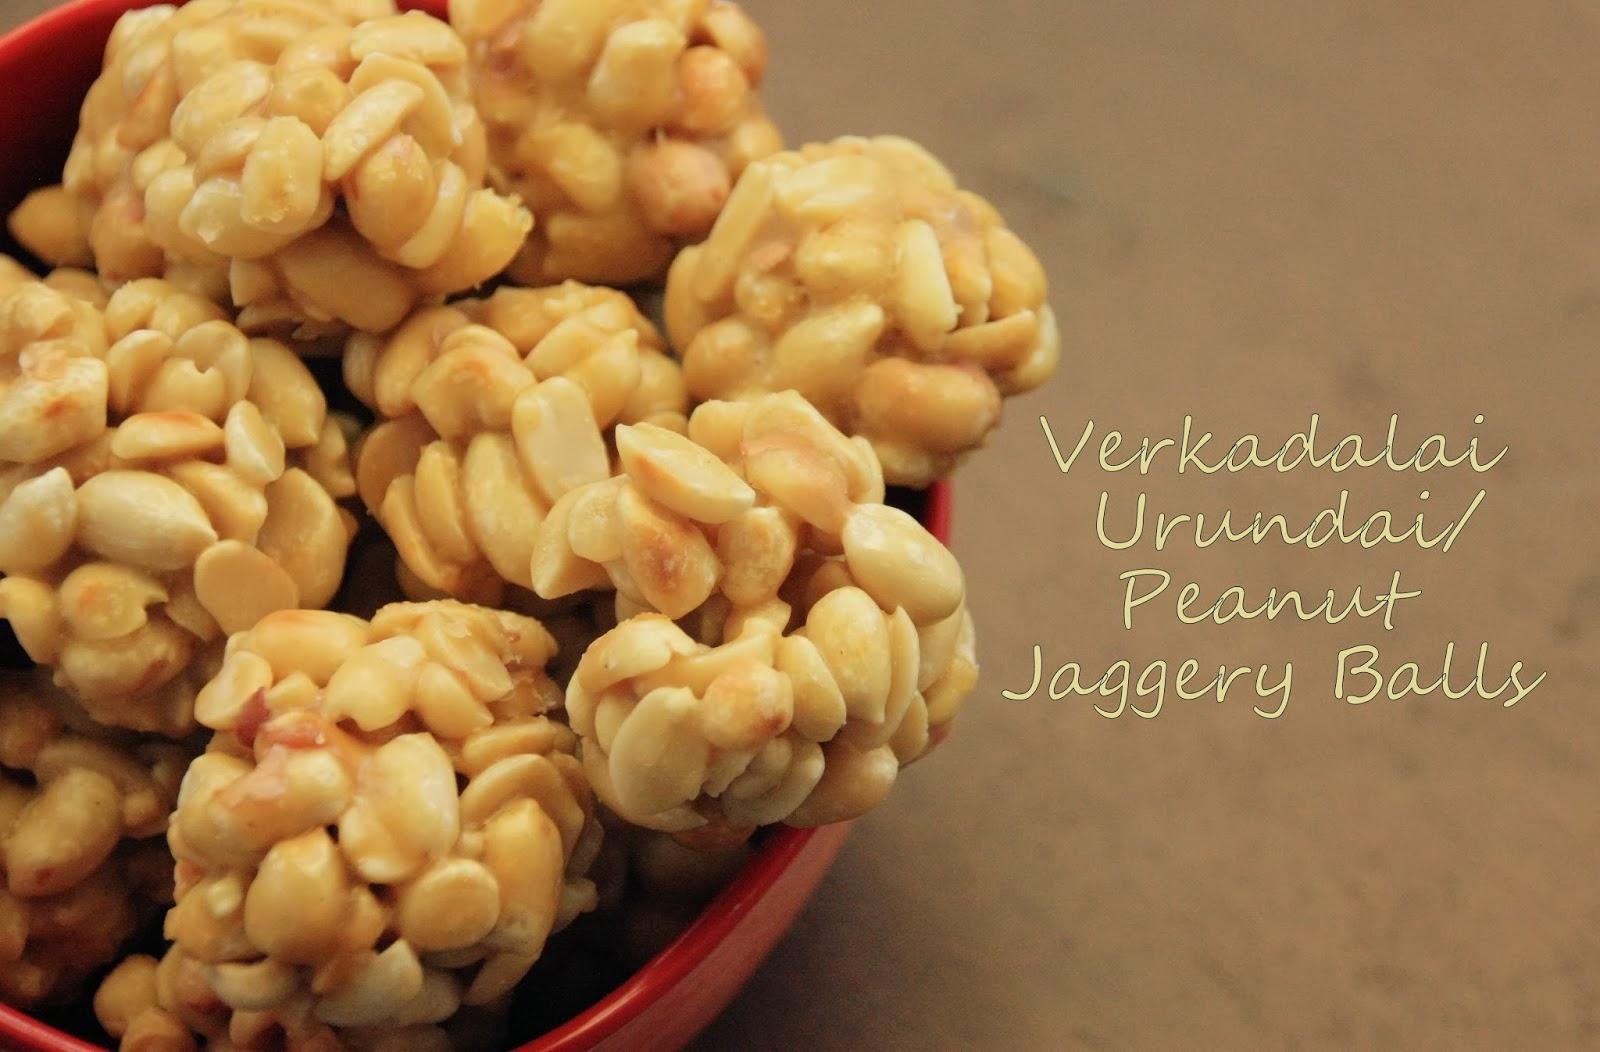 Sugar Amp Spice Groundnut Jaggery Balls Verkadalai Urundai